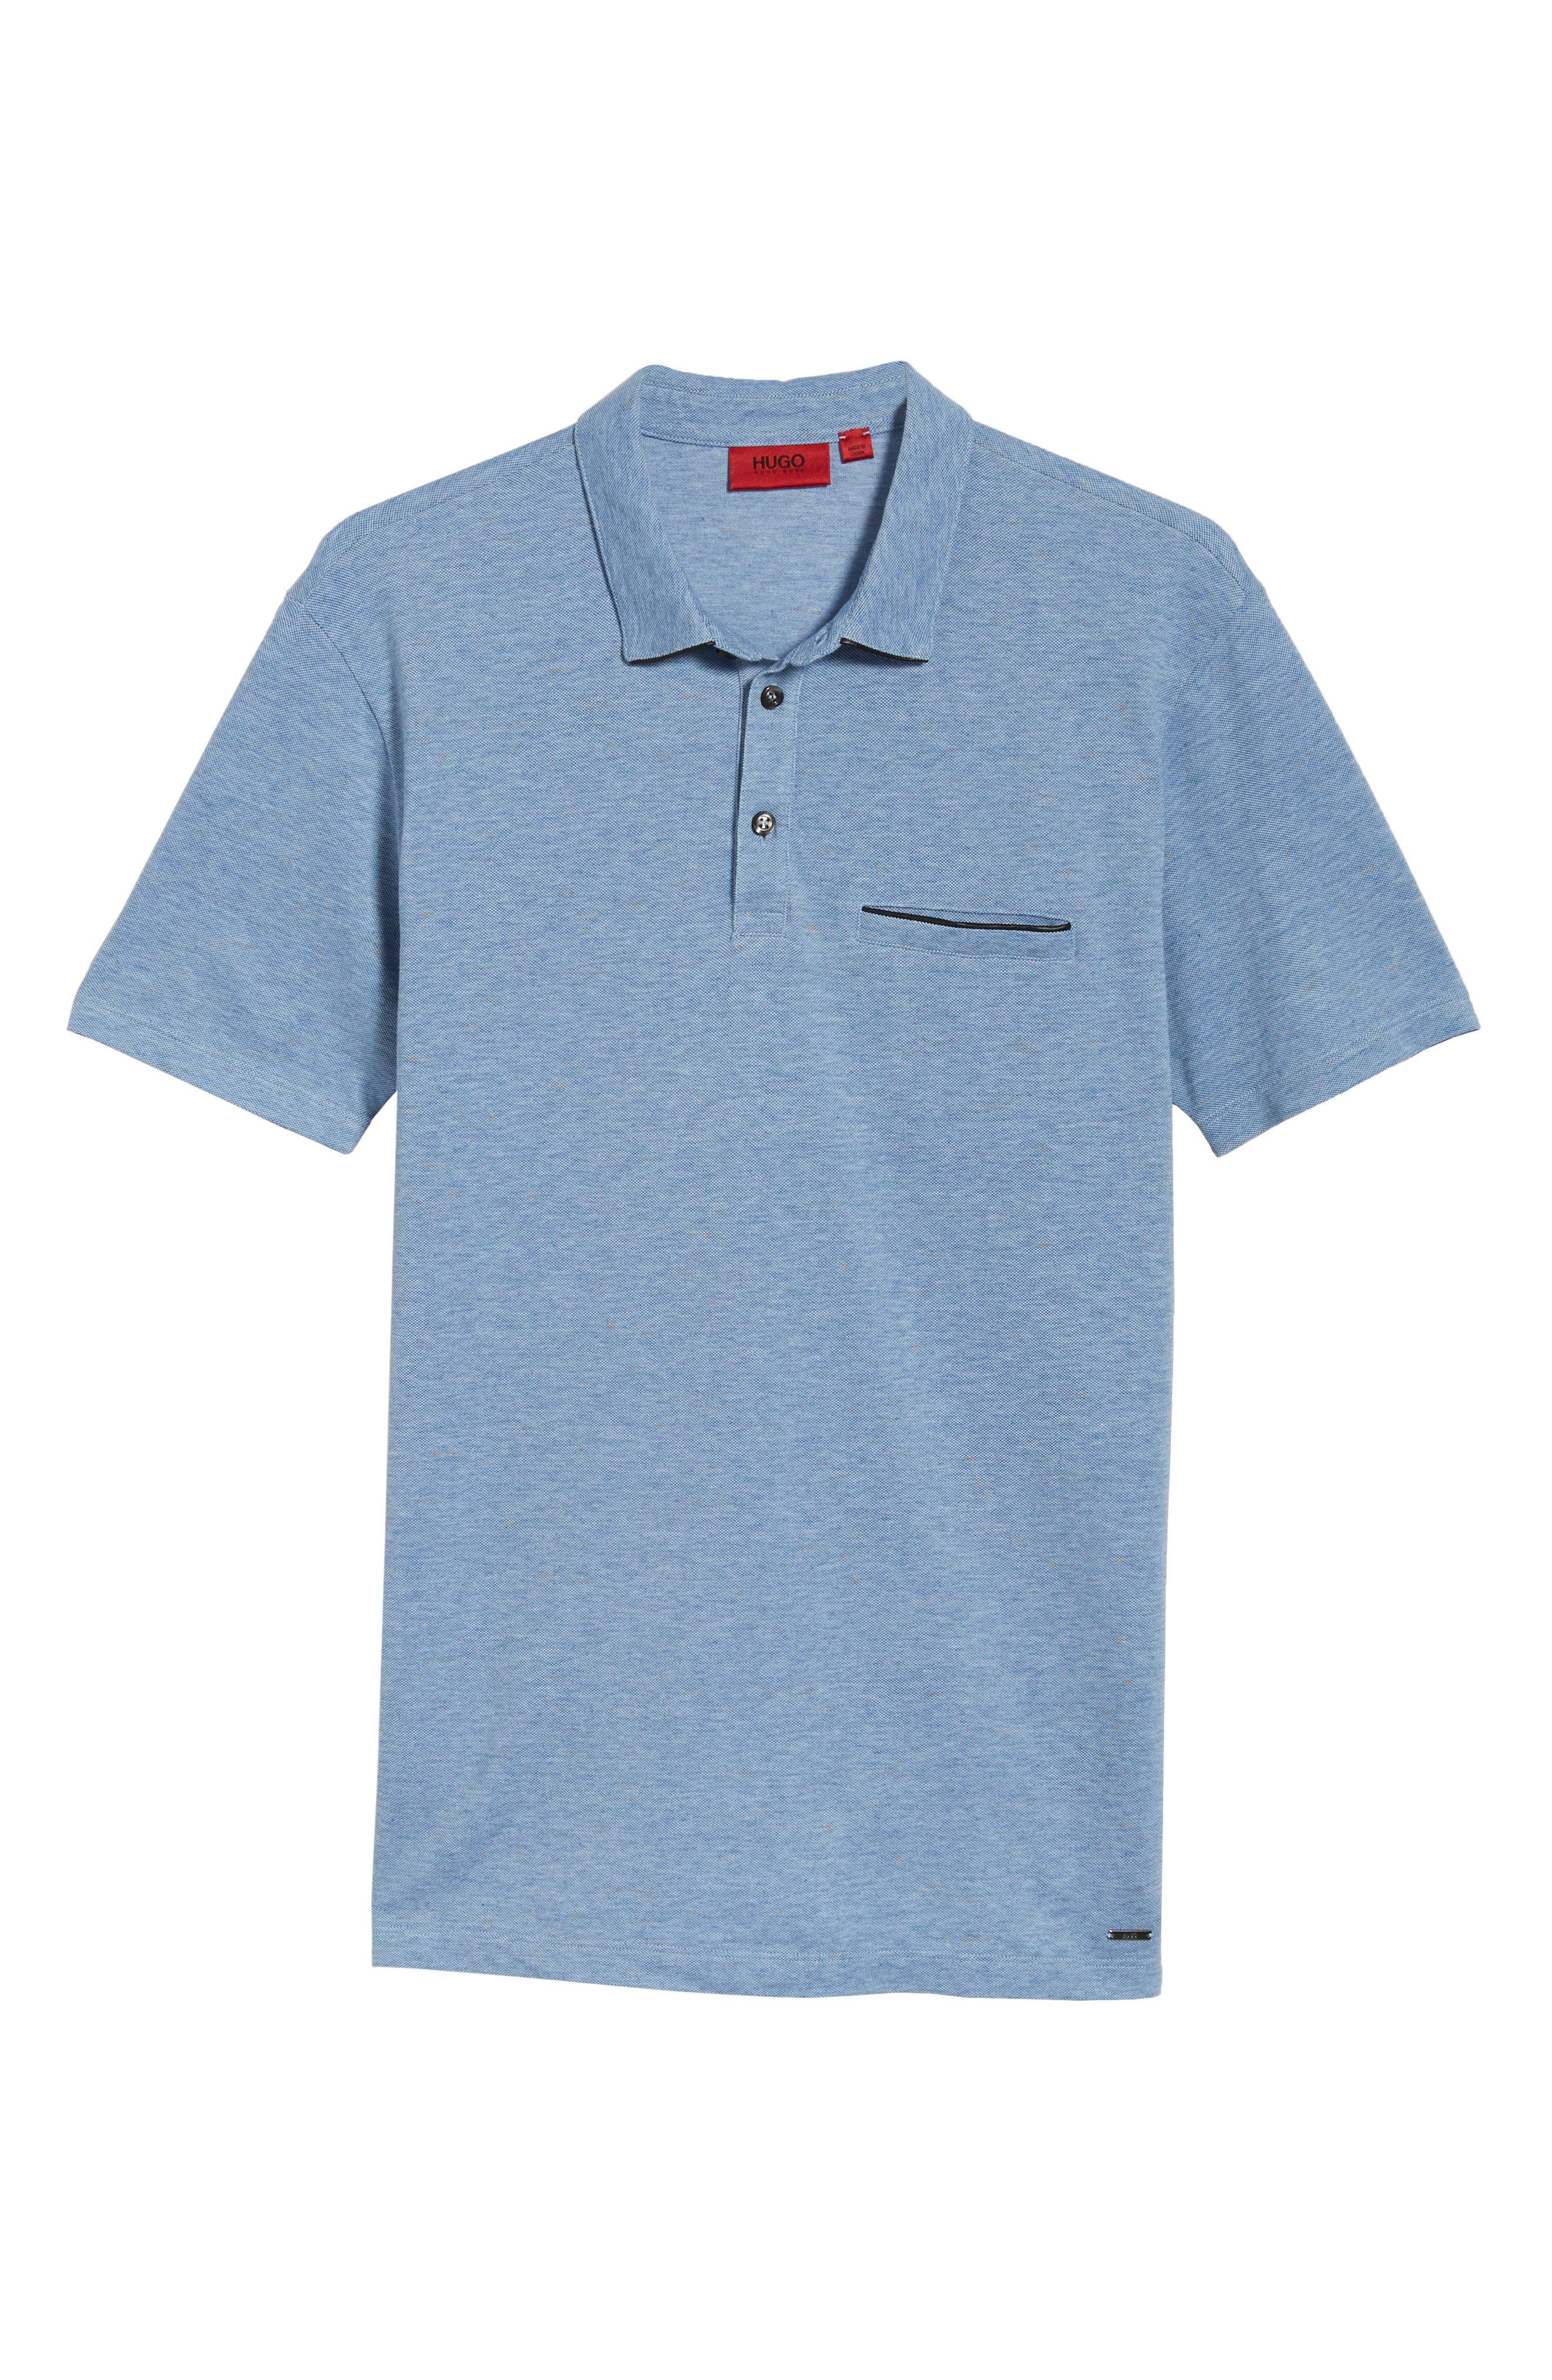 Darrow Cotton Polo Shirt,                             Alternate thumbnail 6, color,                             Blue